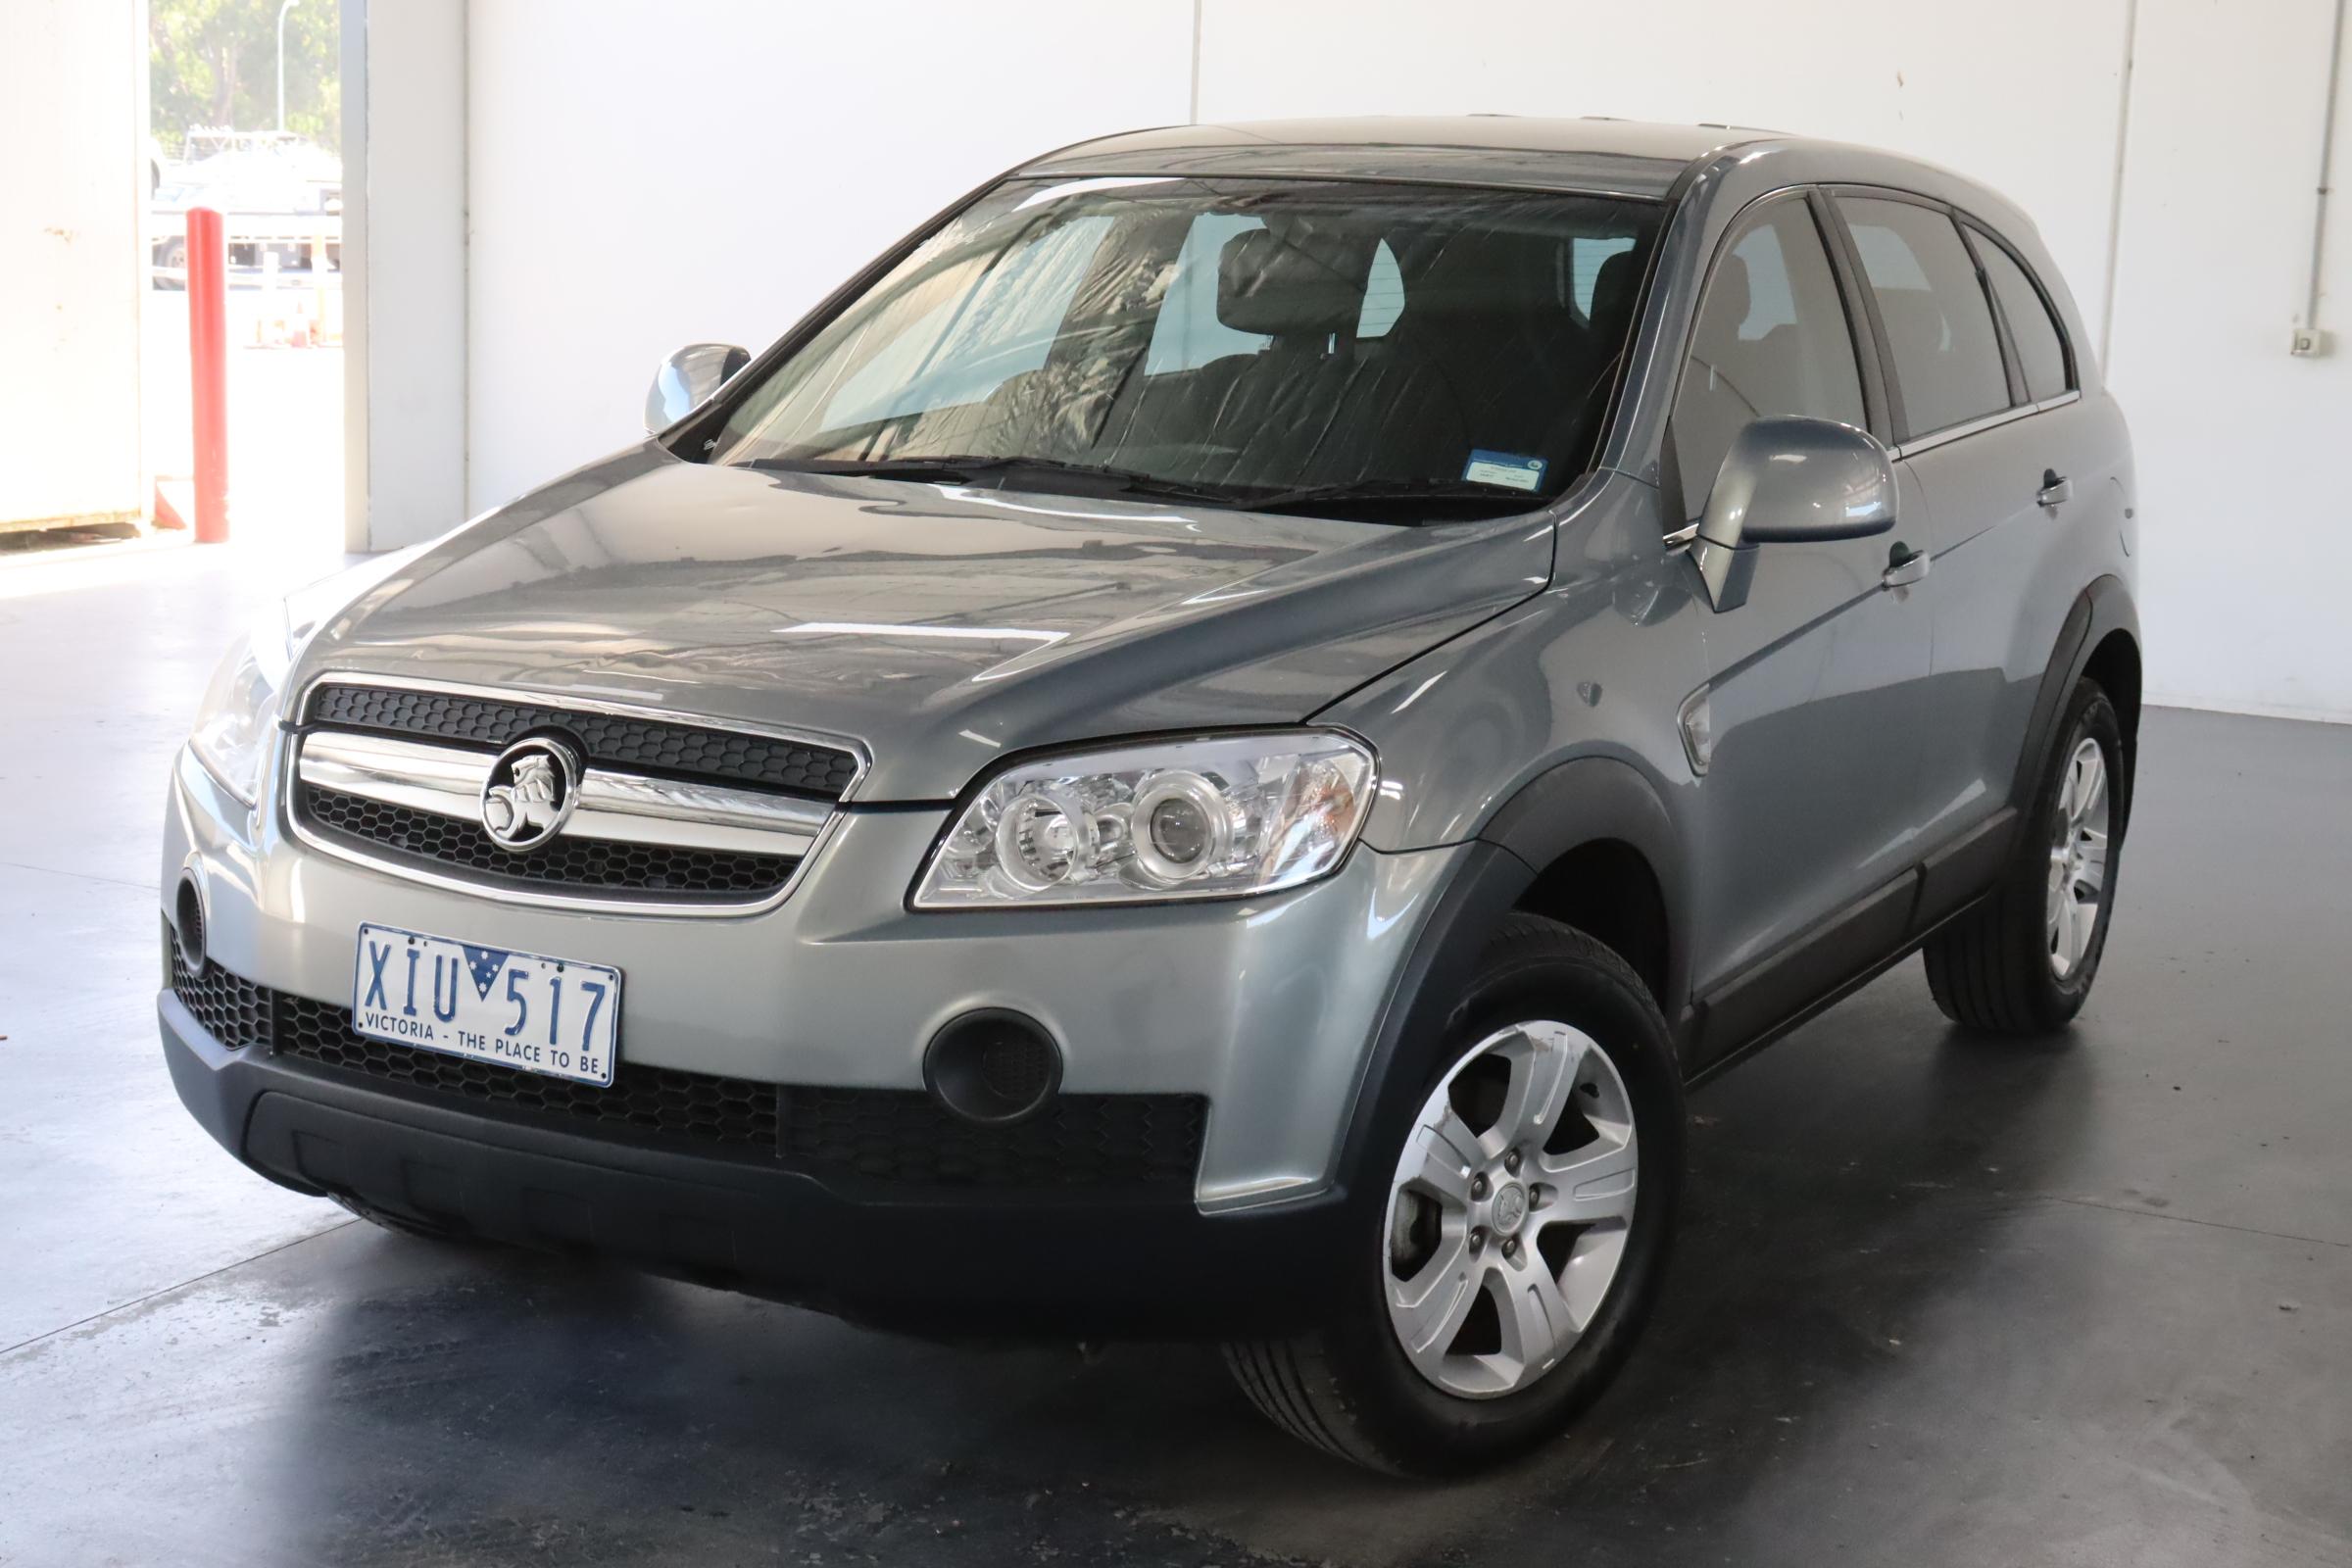 2009 Holden Captiva SX (4x4) CG Automatic 7 Seats Wagon